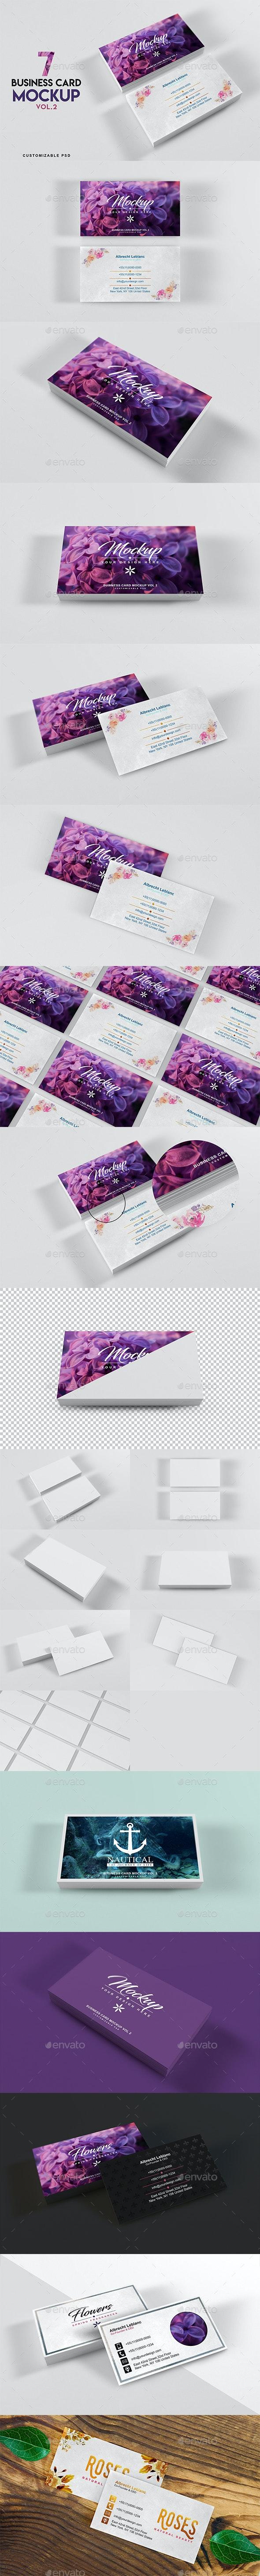 Business Card Mockup Vol 2 - Business Cards Print